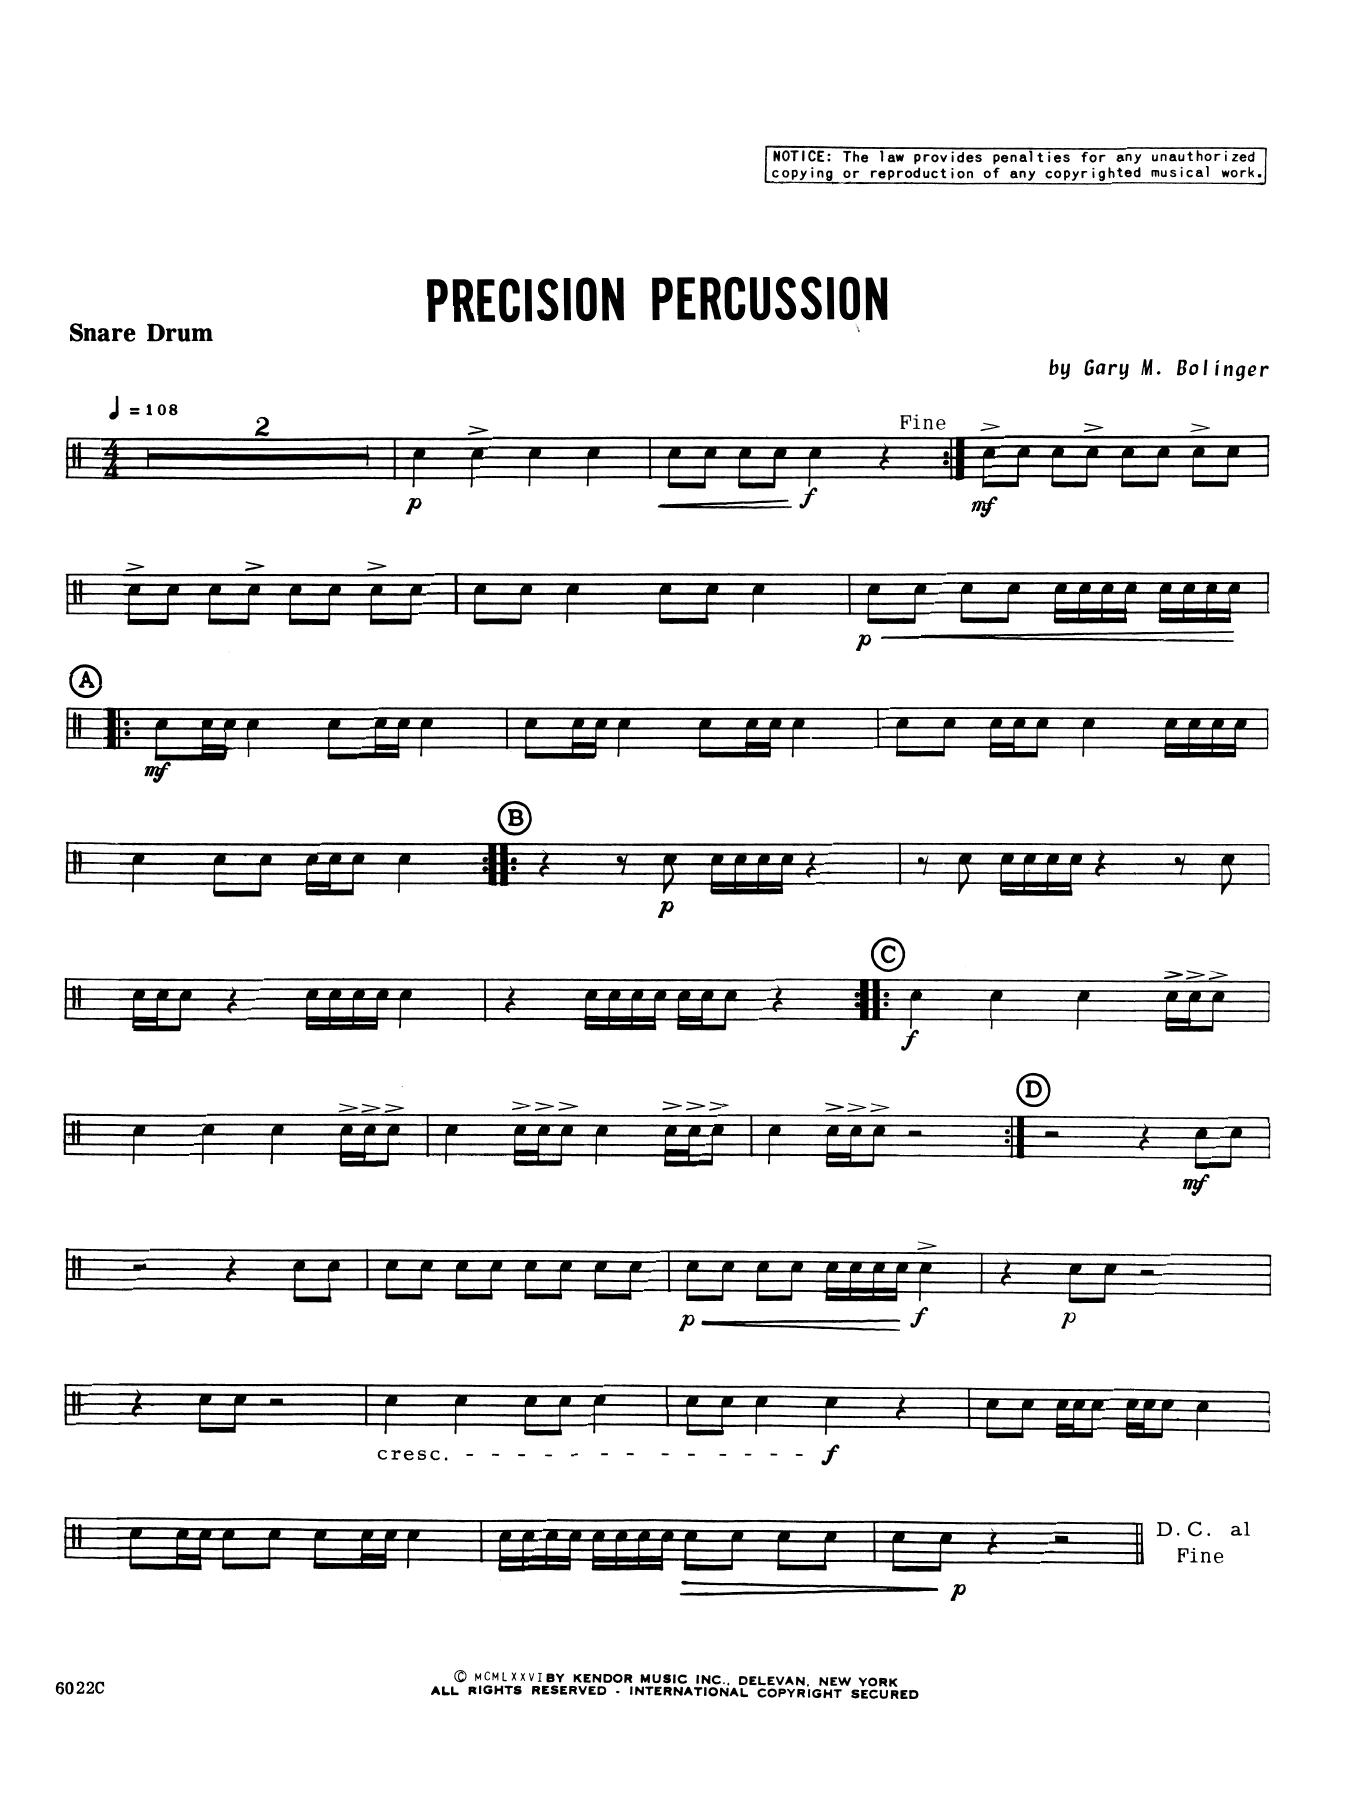 Gary M. Bolinger Precision Percussion - Percussion 1 sheet music notes printable PDF score